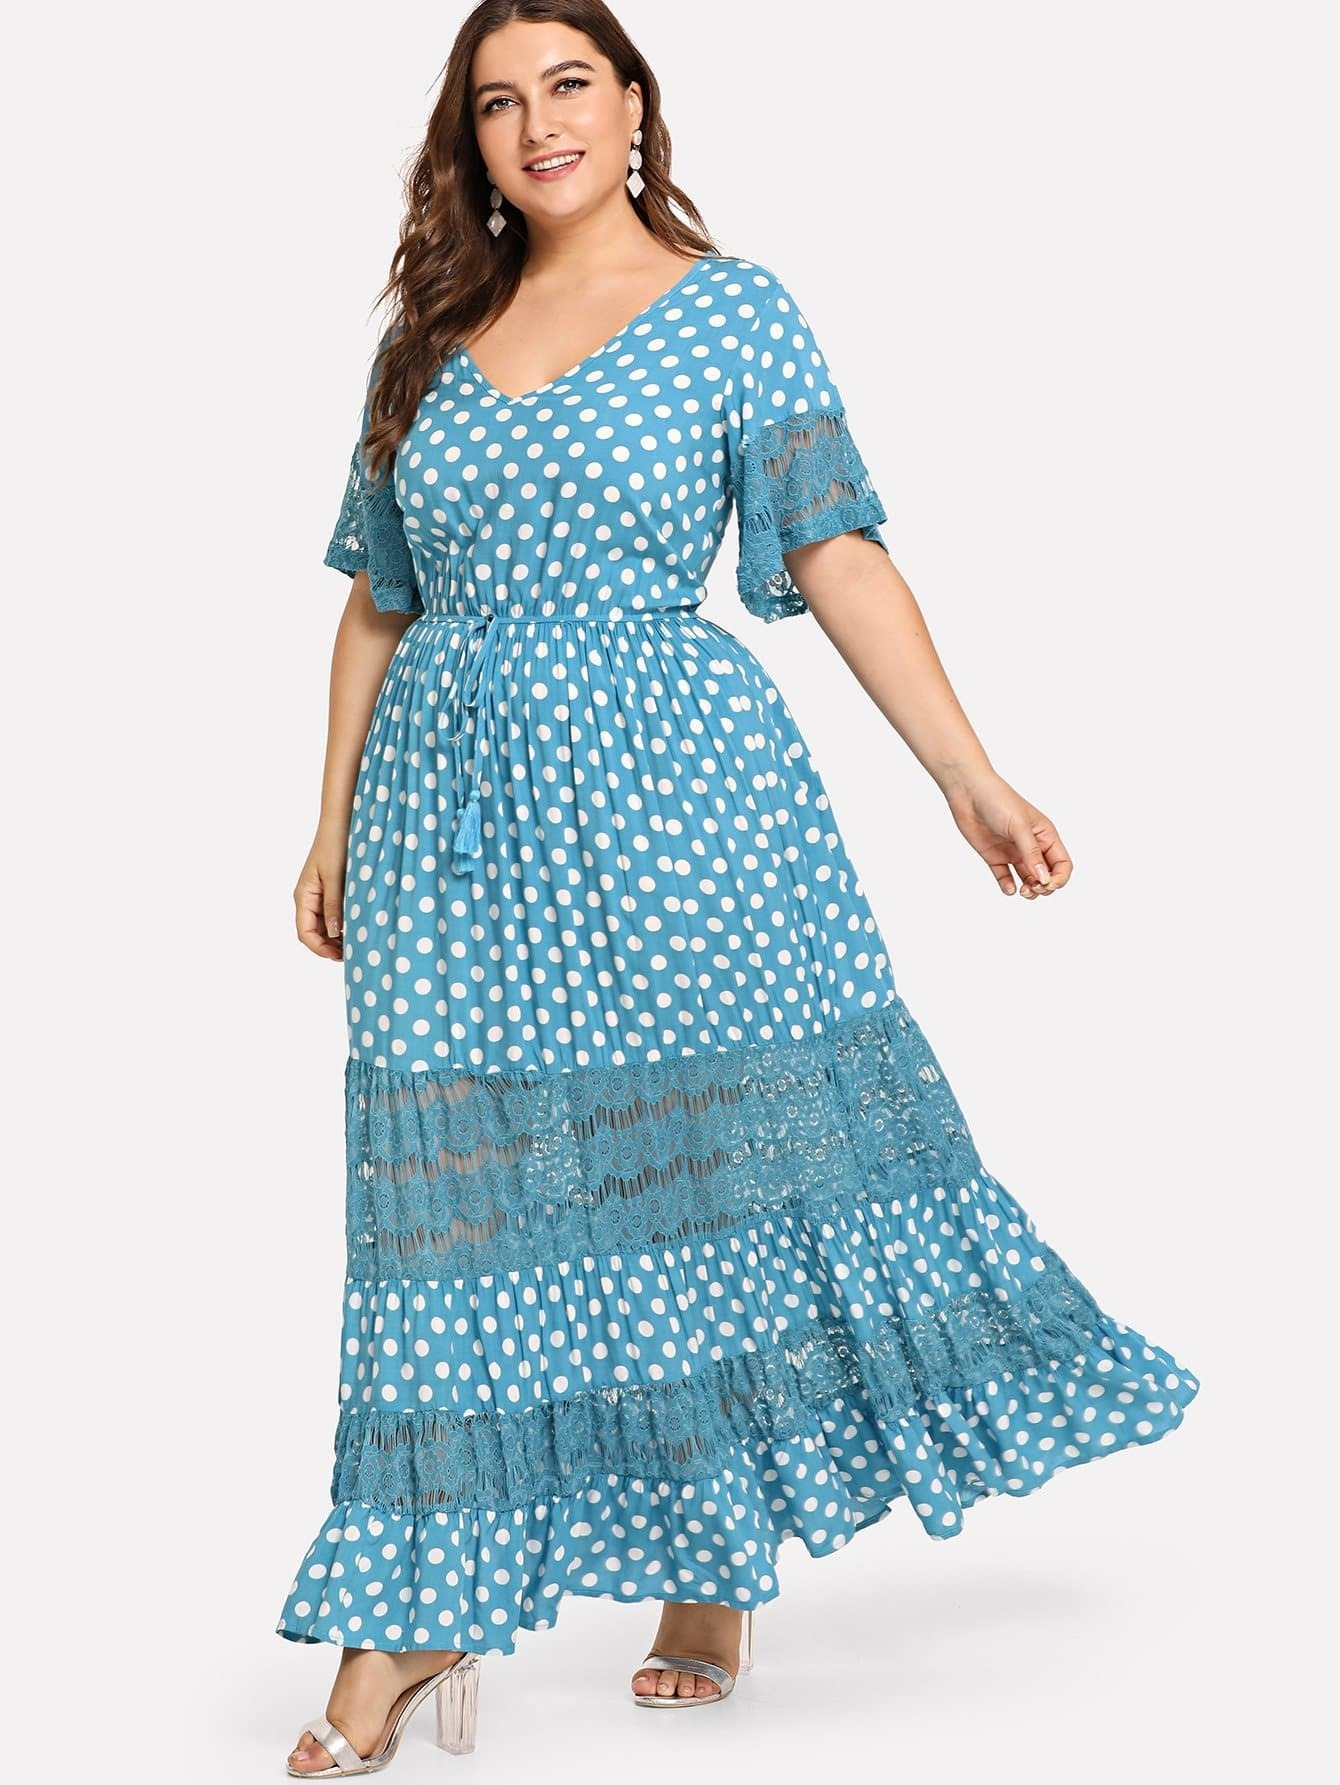 Plus Lace Insert Bell Sleeve Polka Dot Dress plus size mesh insert polka dot dress